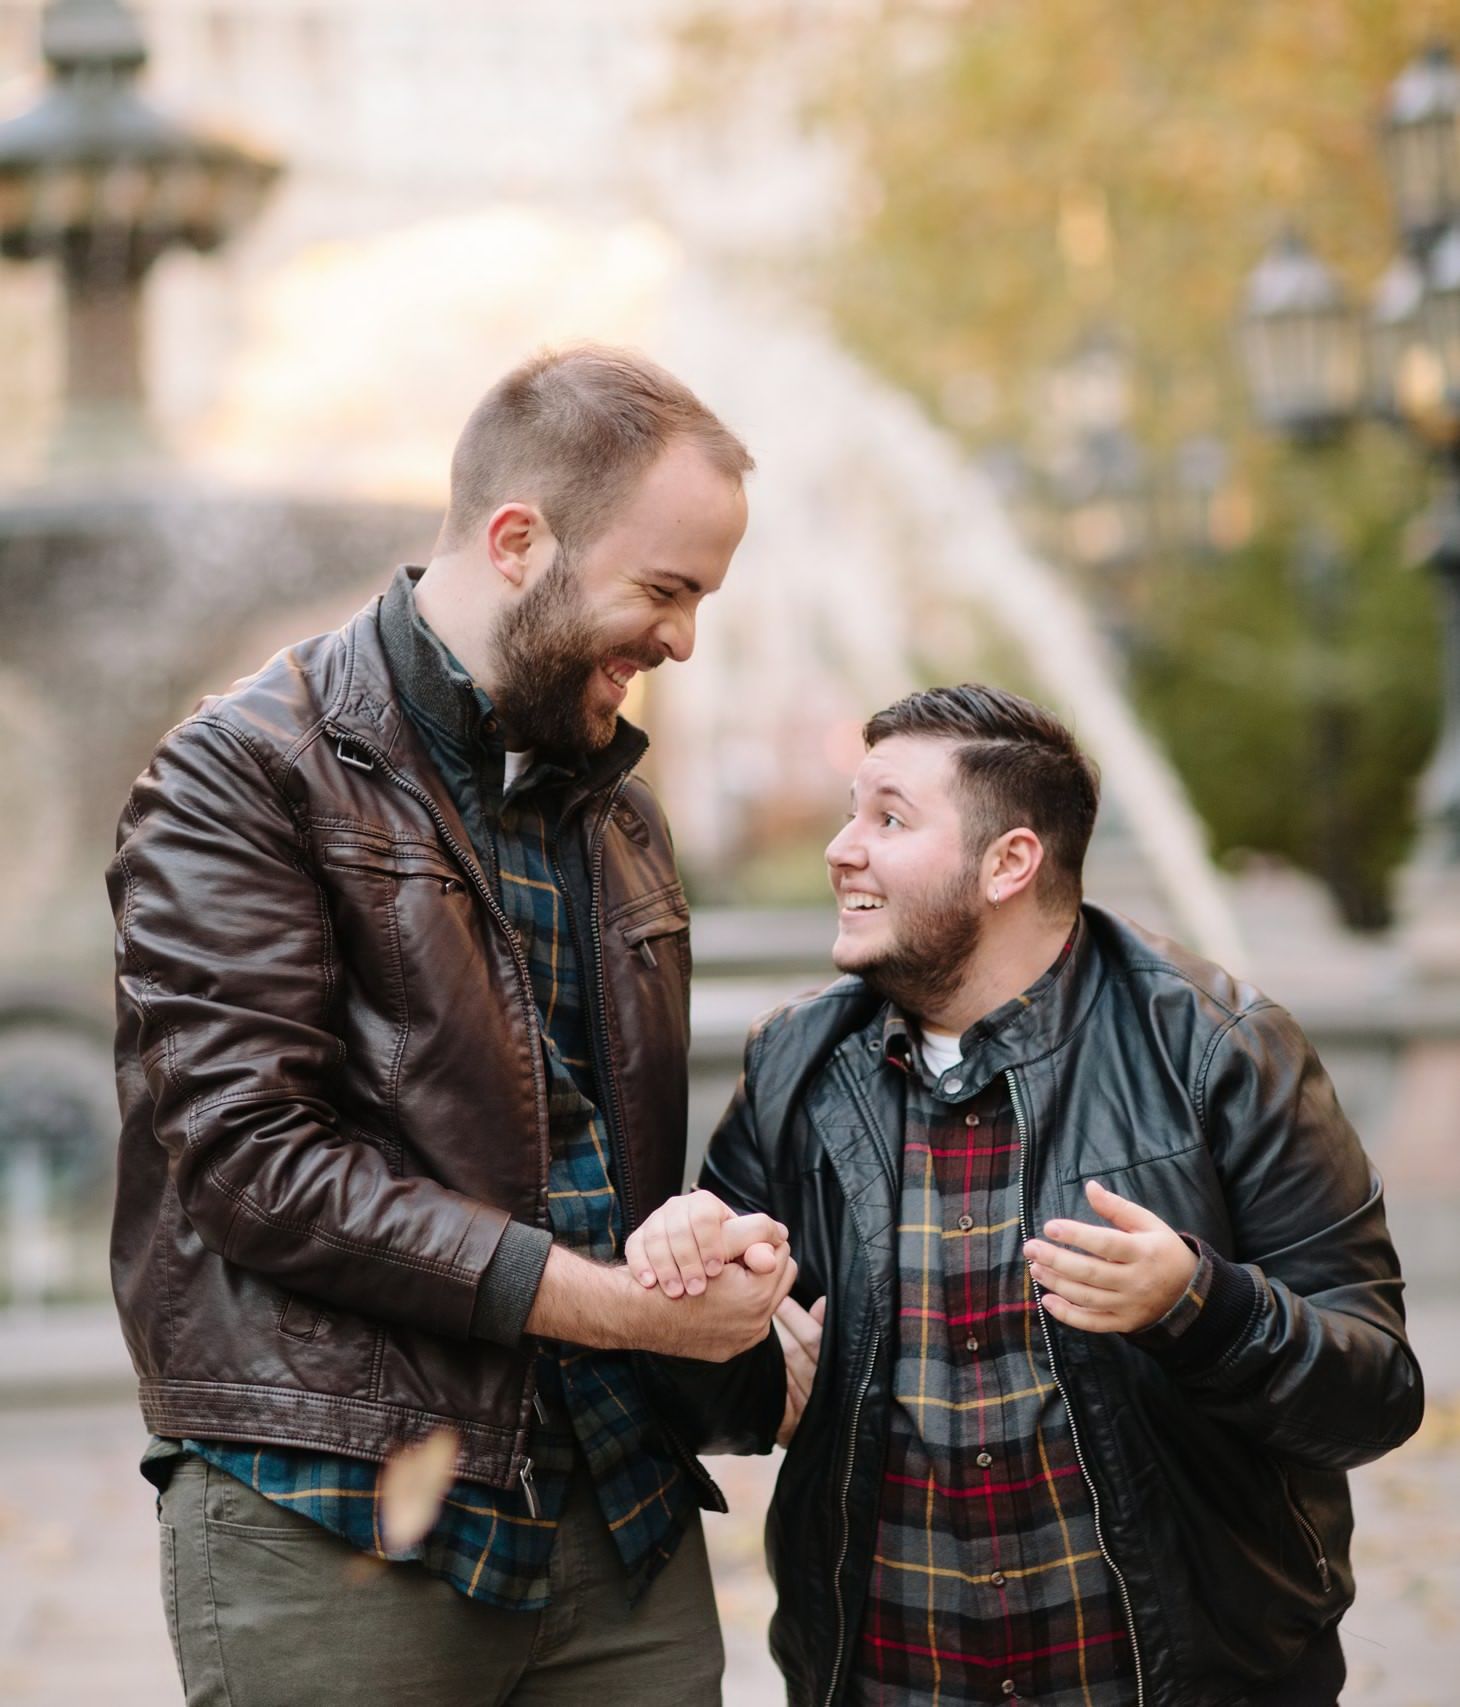 005-nyc-wedding-elopement-lgbt-friendly-photographer-city-hall-kareoke.jpg